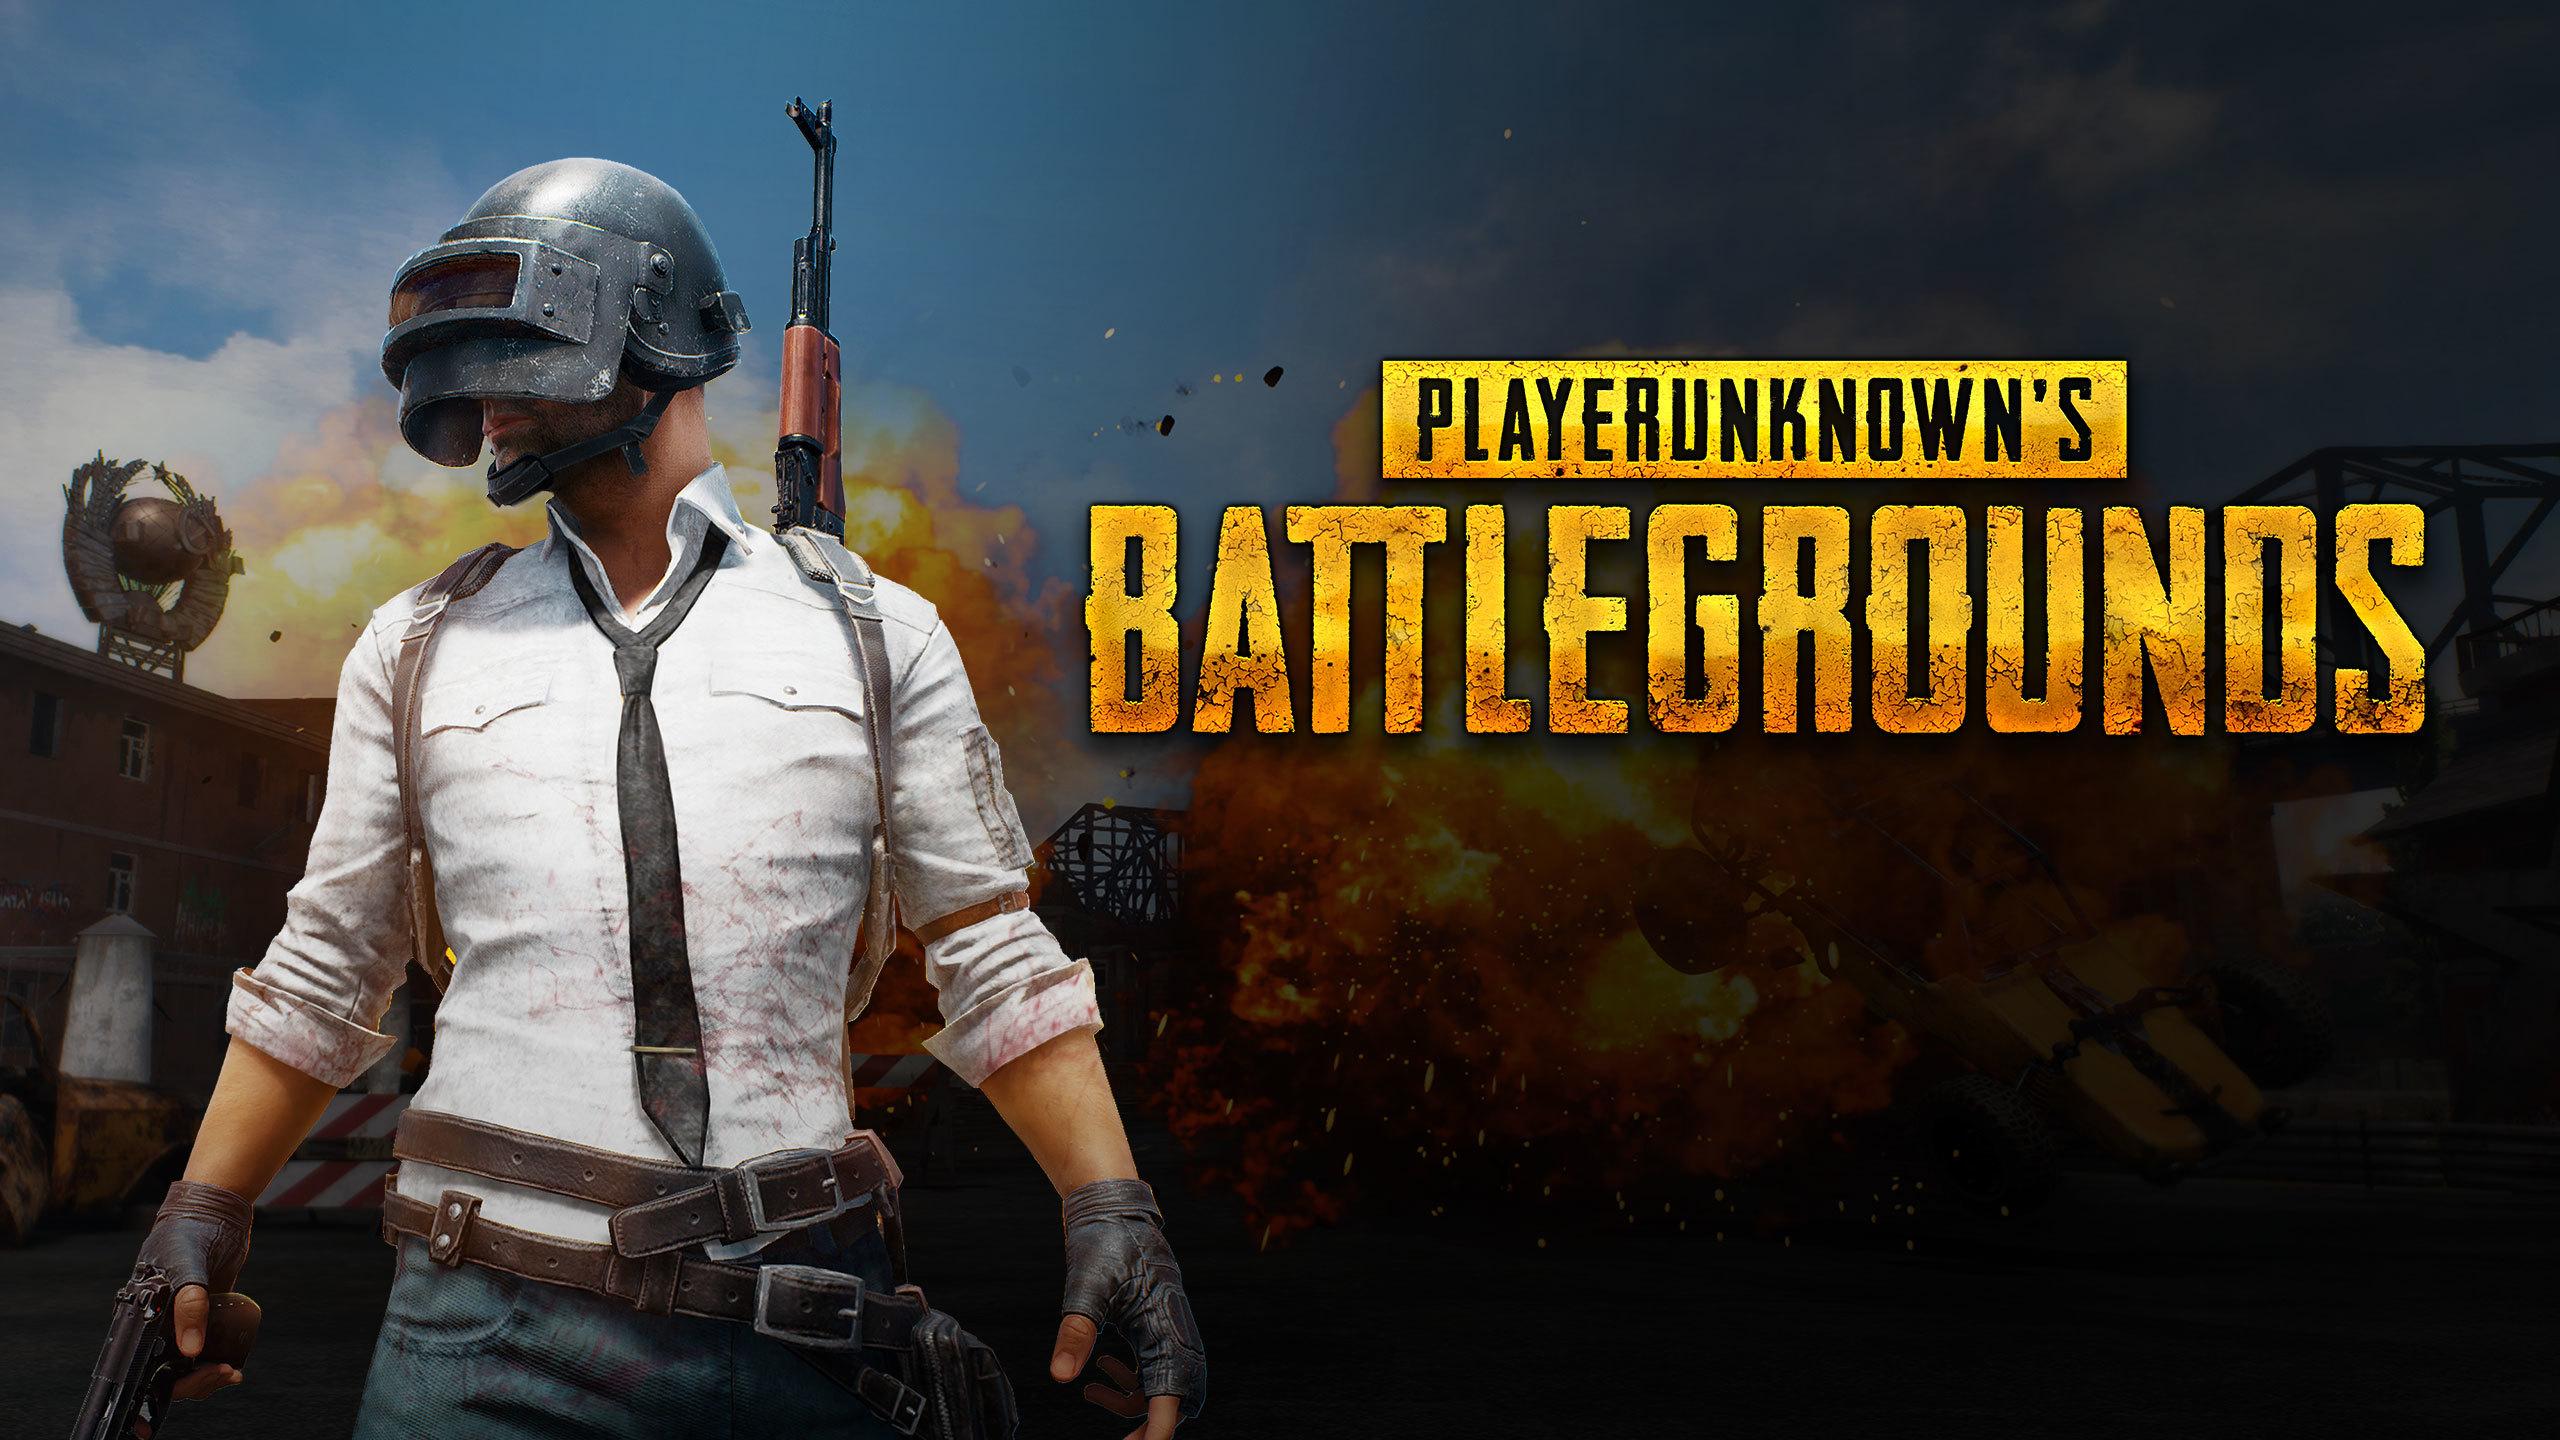 Requisitos de Playerunknown's Battlegrounds